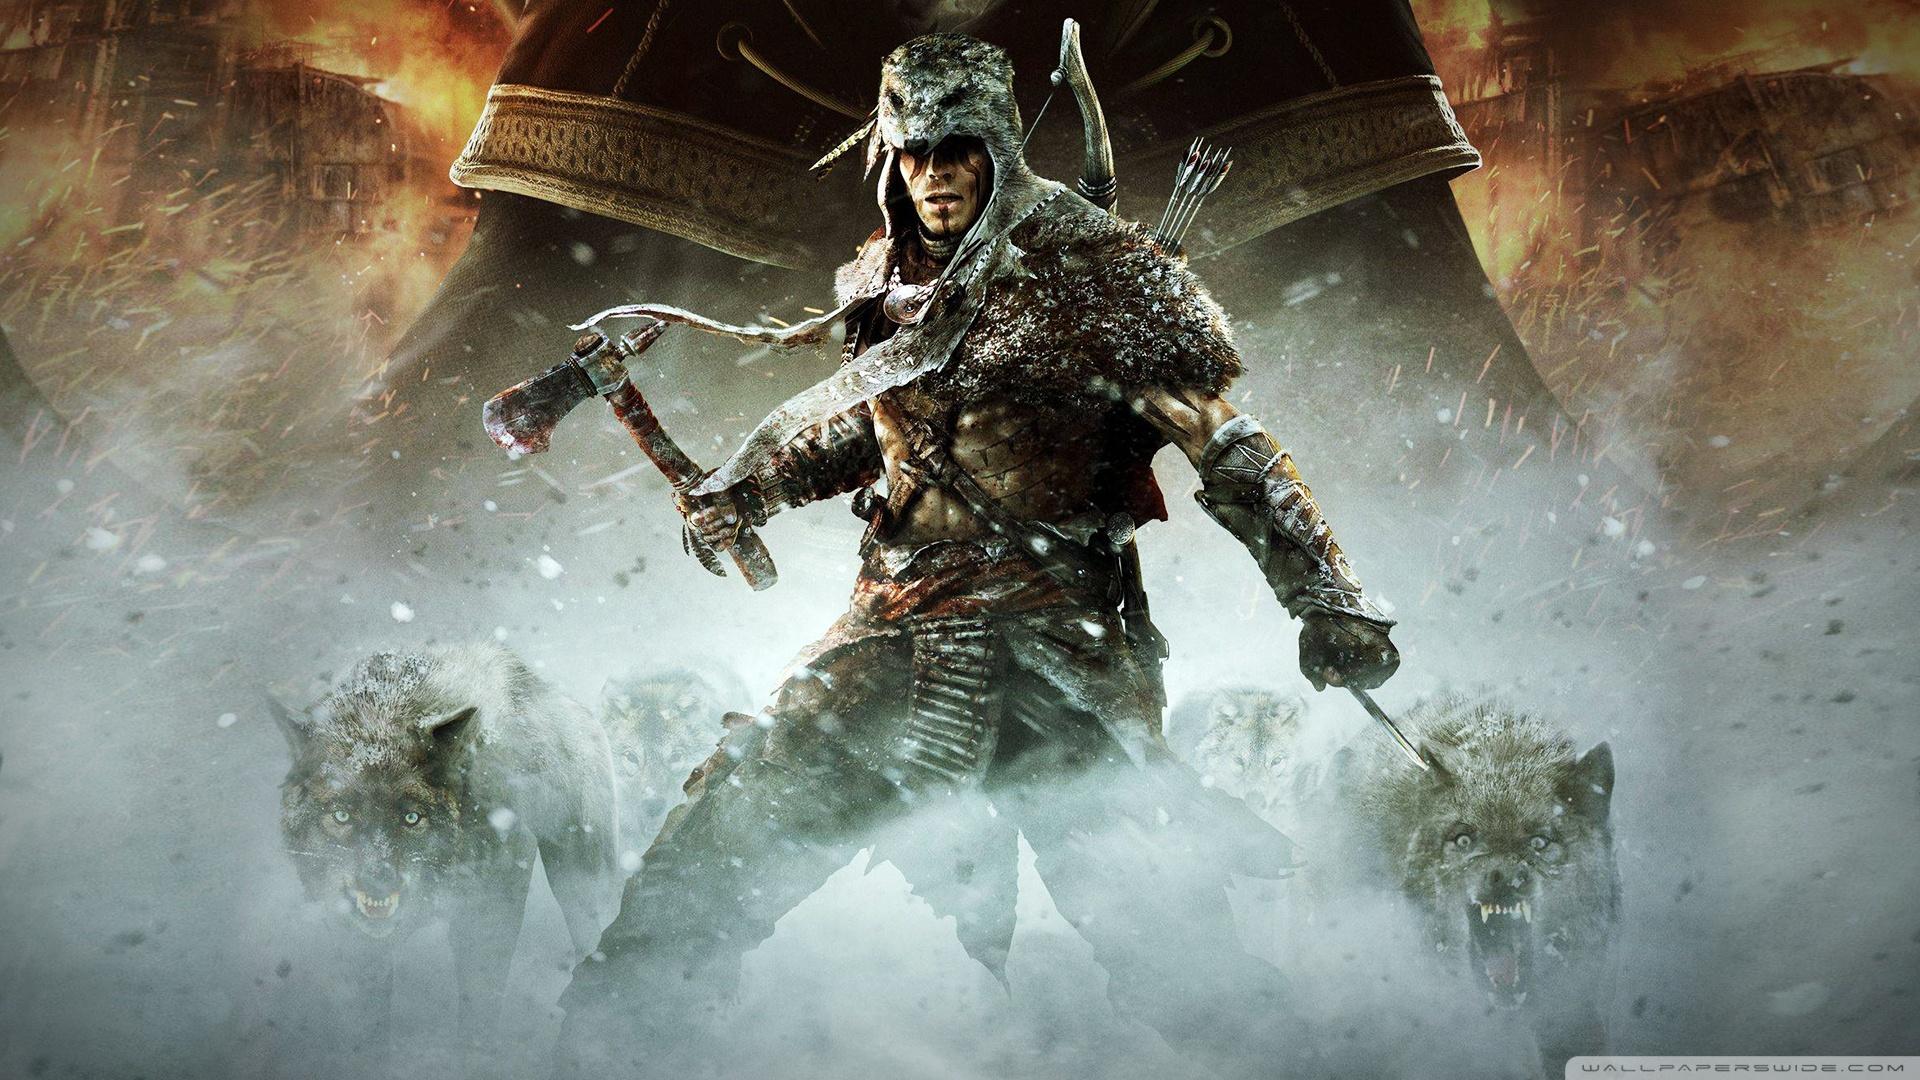 Free Download Assassins Creed Iii The Tyranny Of King Washington